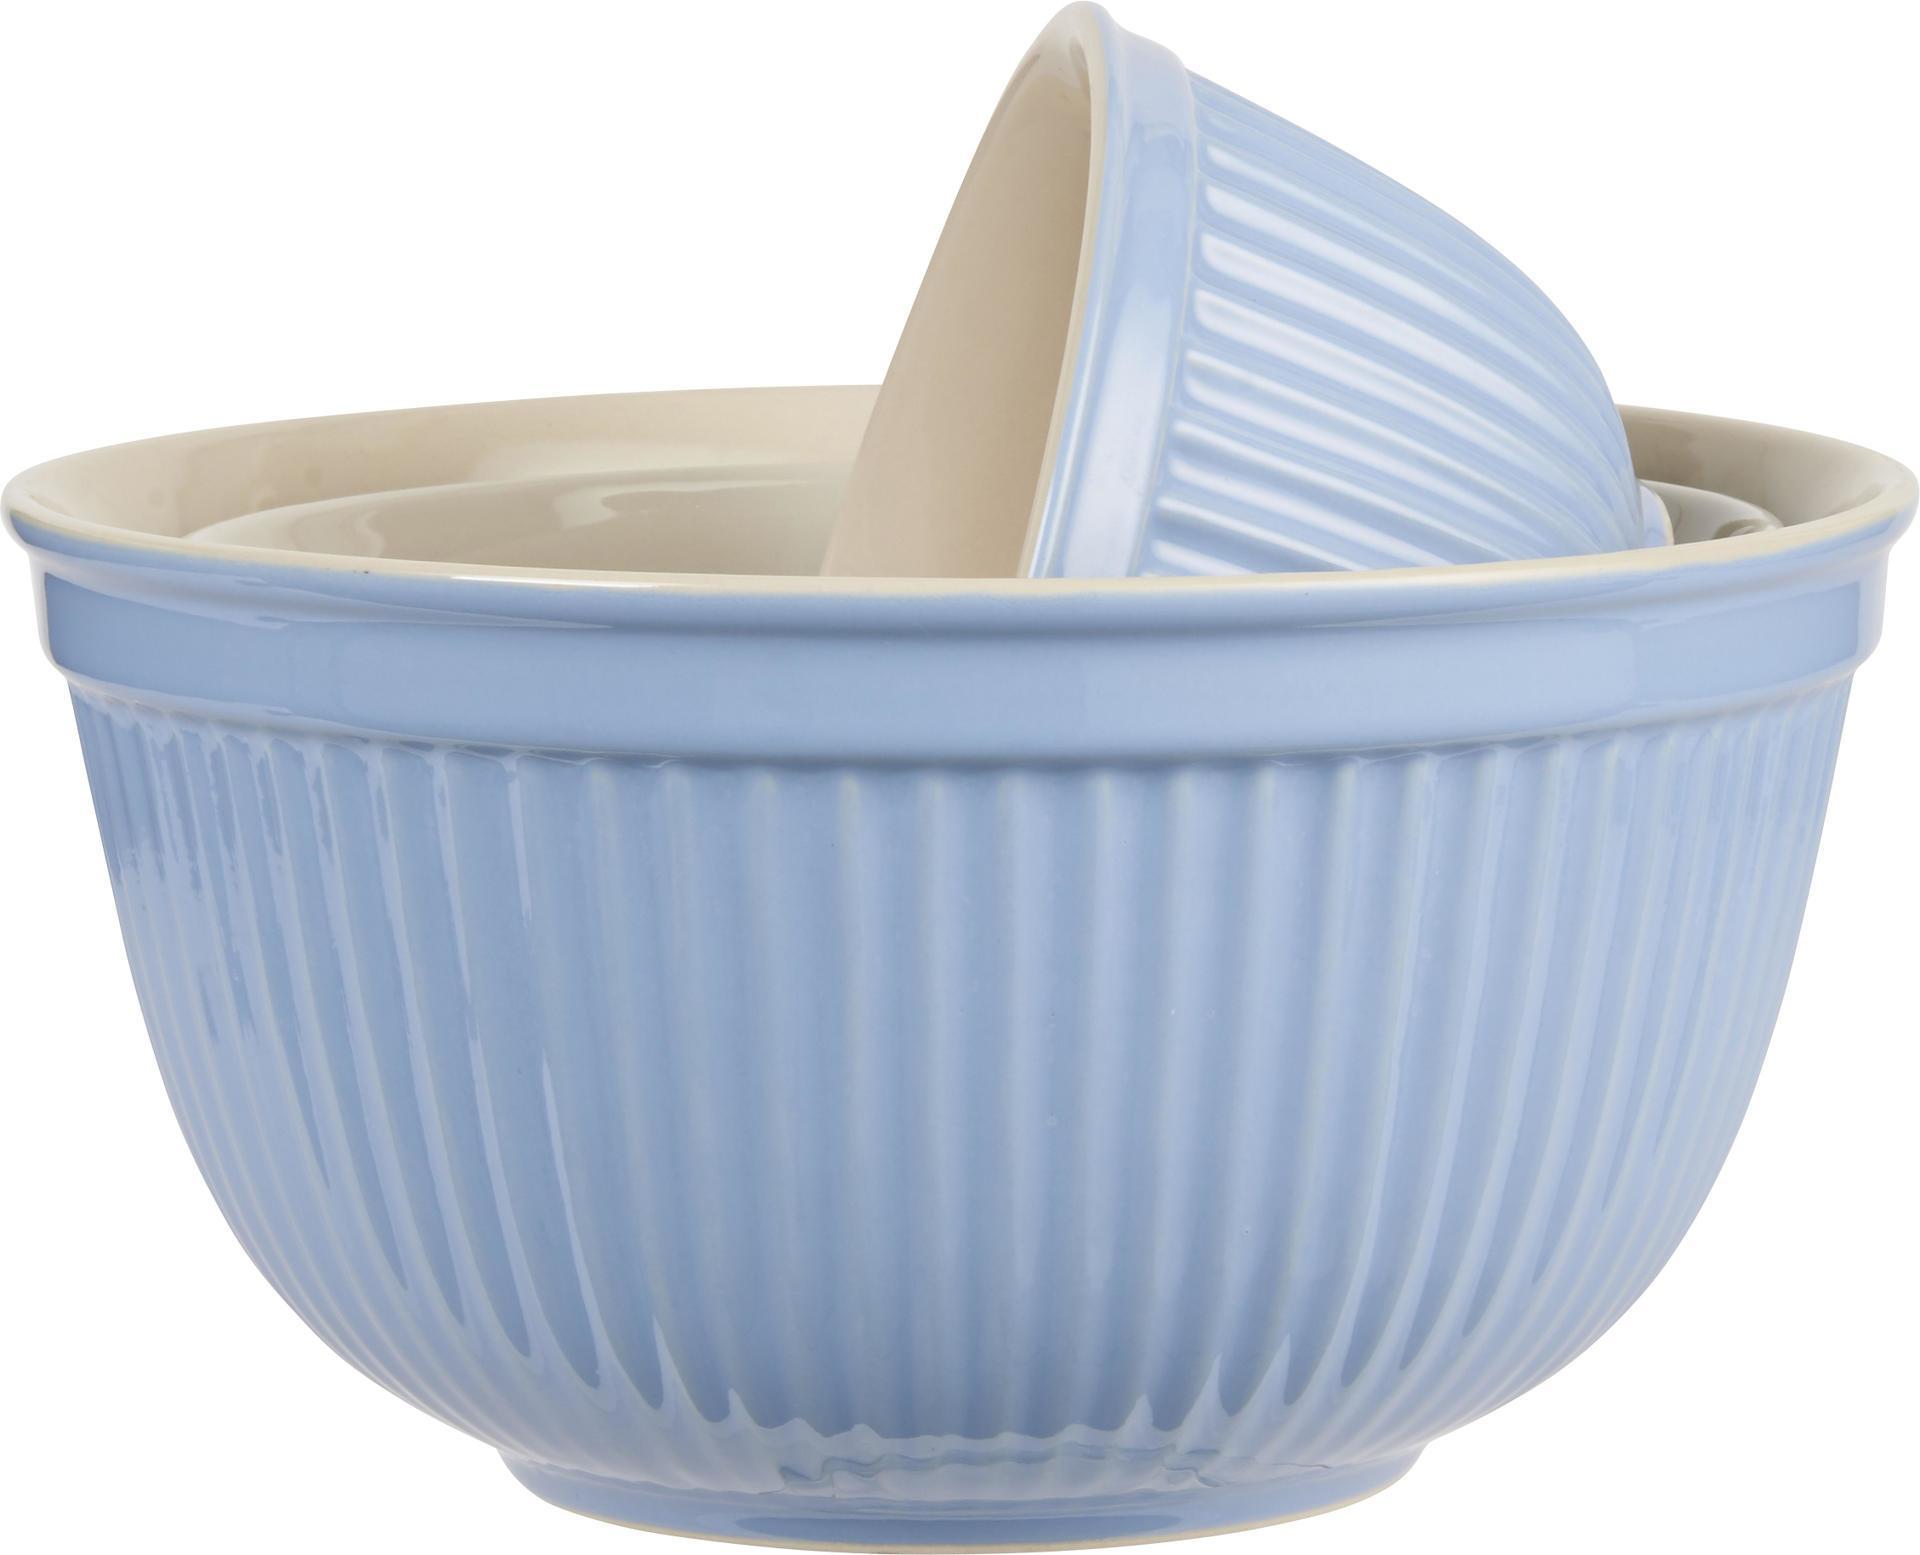 IB LAURSEN Keramická mísa Mynte nordic sky Velikost S, modrá barva, keramika